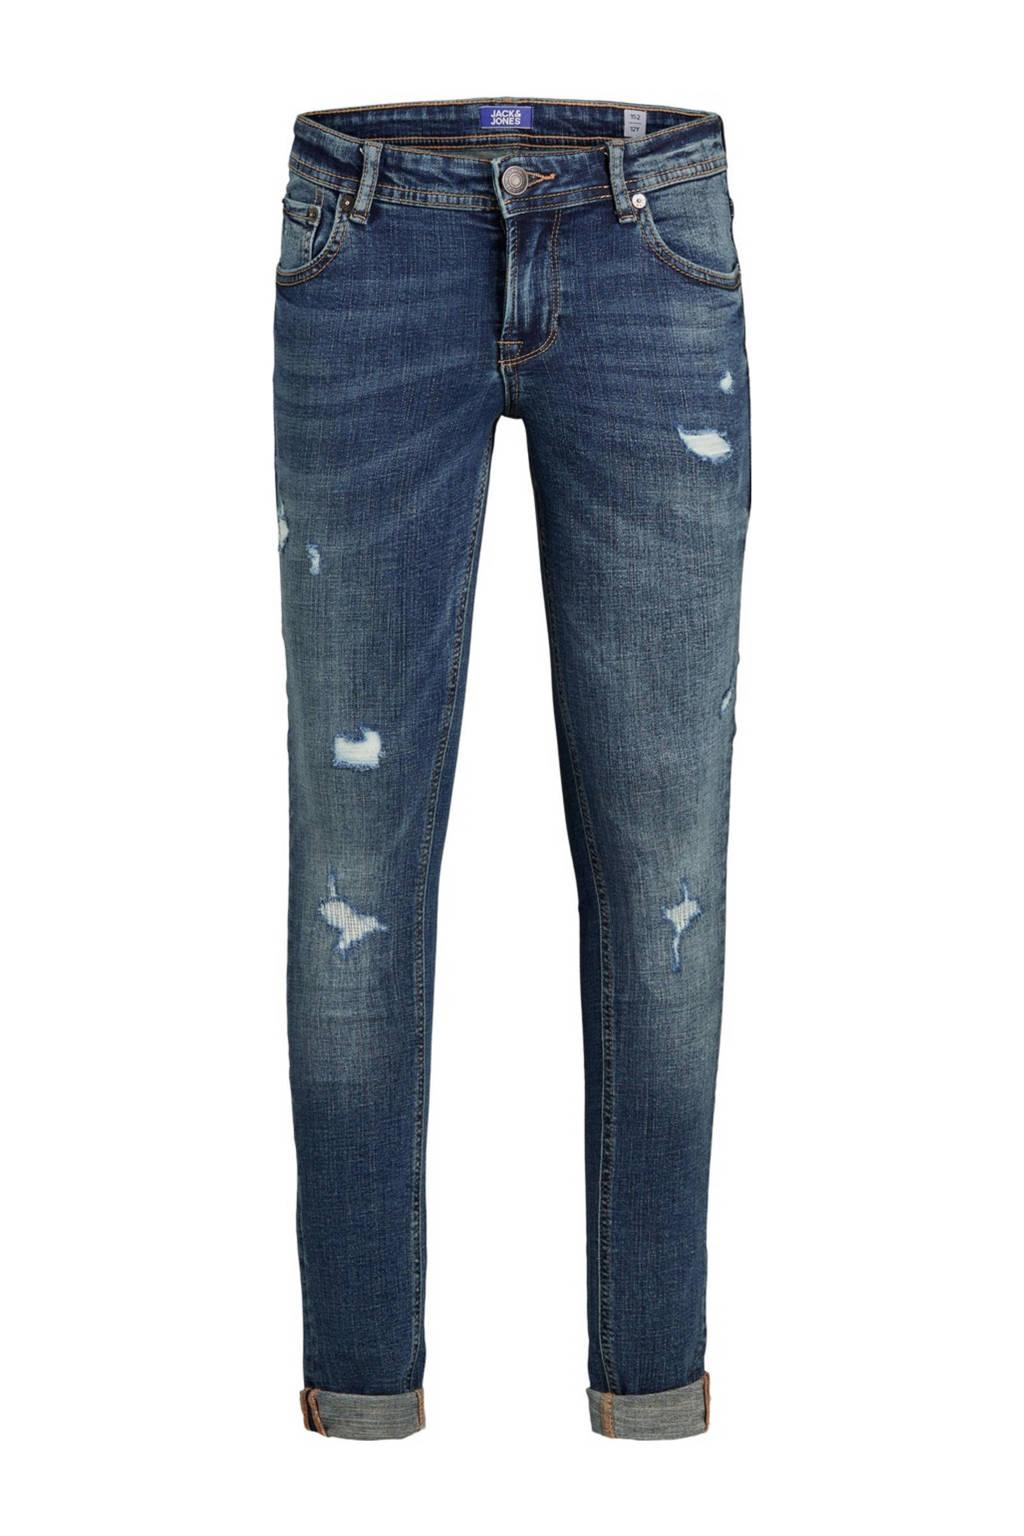 JACK & JONES JUNIOR super skinny jeans JJIDAN stonewashed, Stonewashed